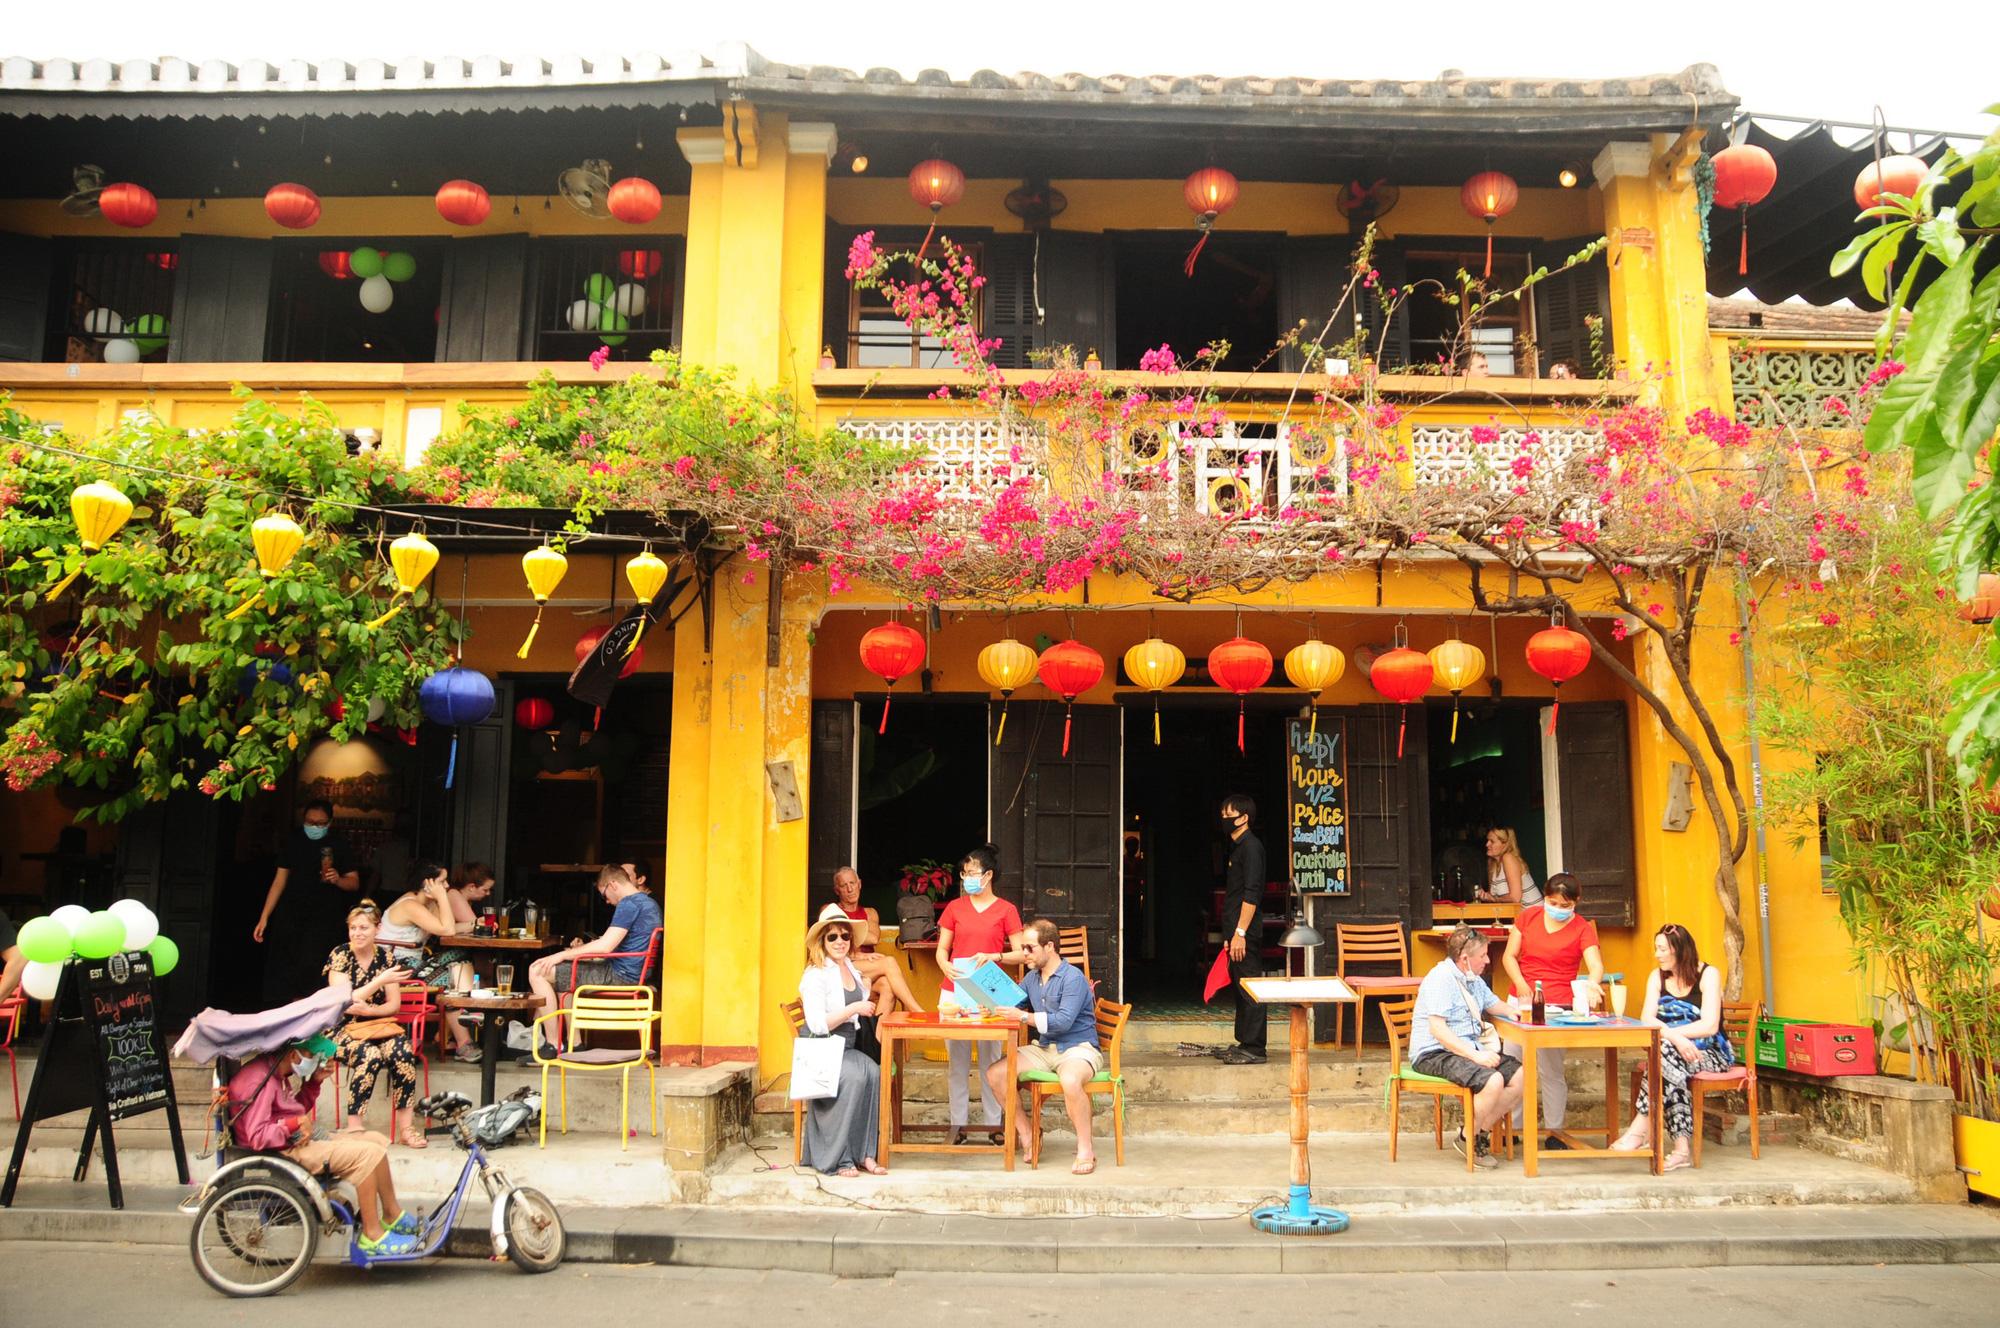 Quang Nam event kickstartsTuoi Tre's tourism stimulus program